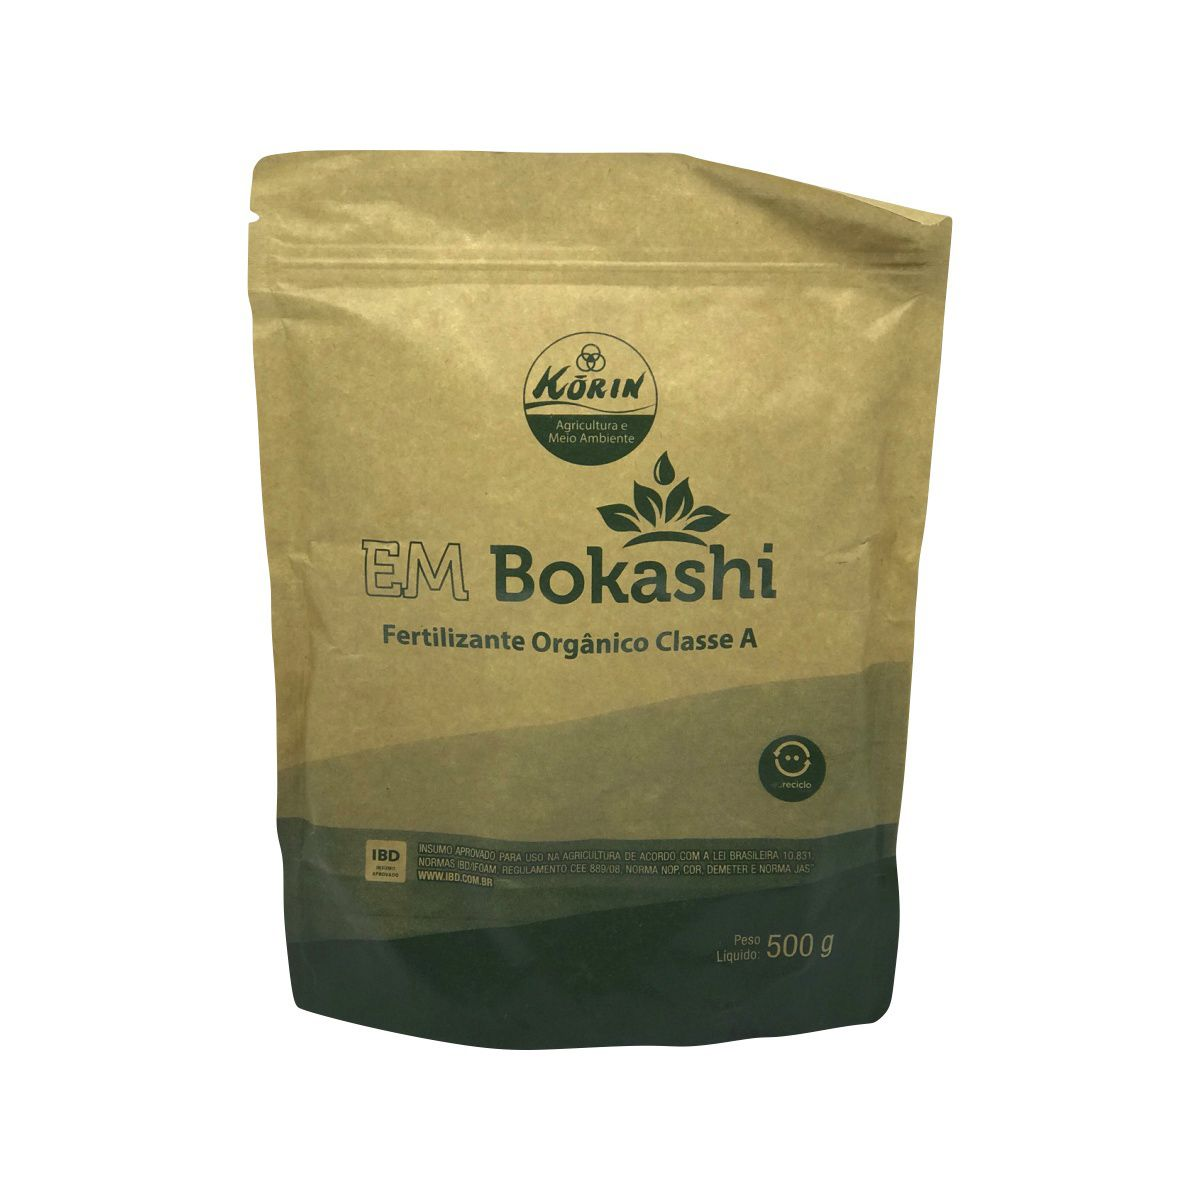 EM Bokashi Fertilizante Orgânico Classe A 500g - Korin